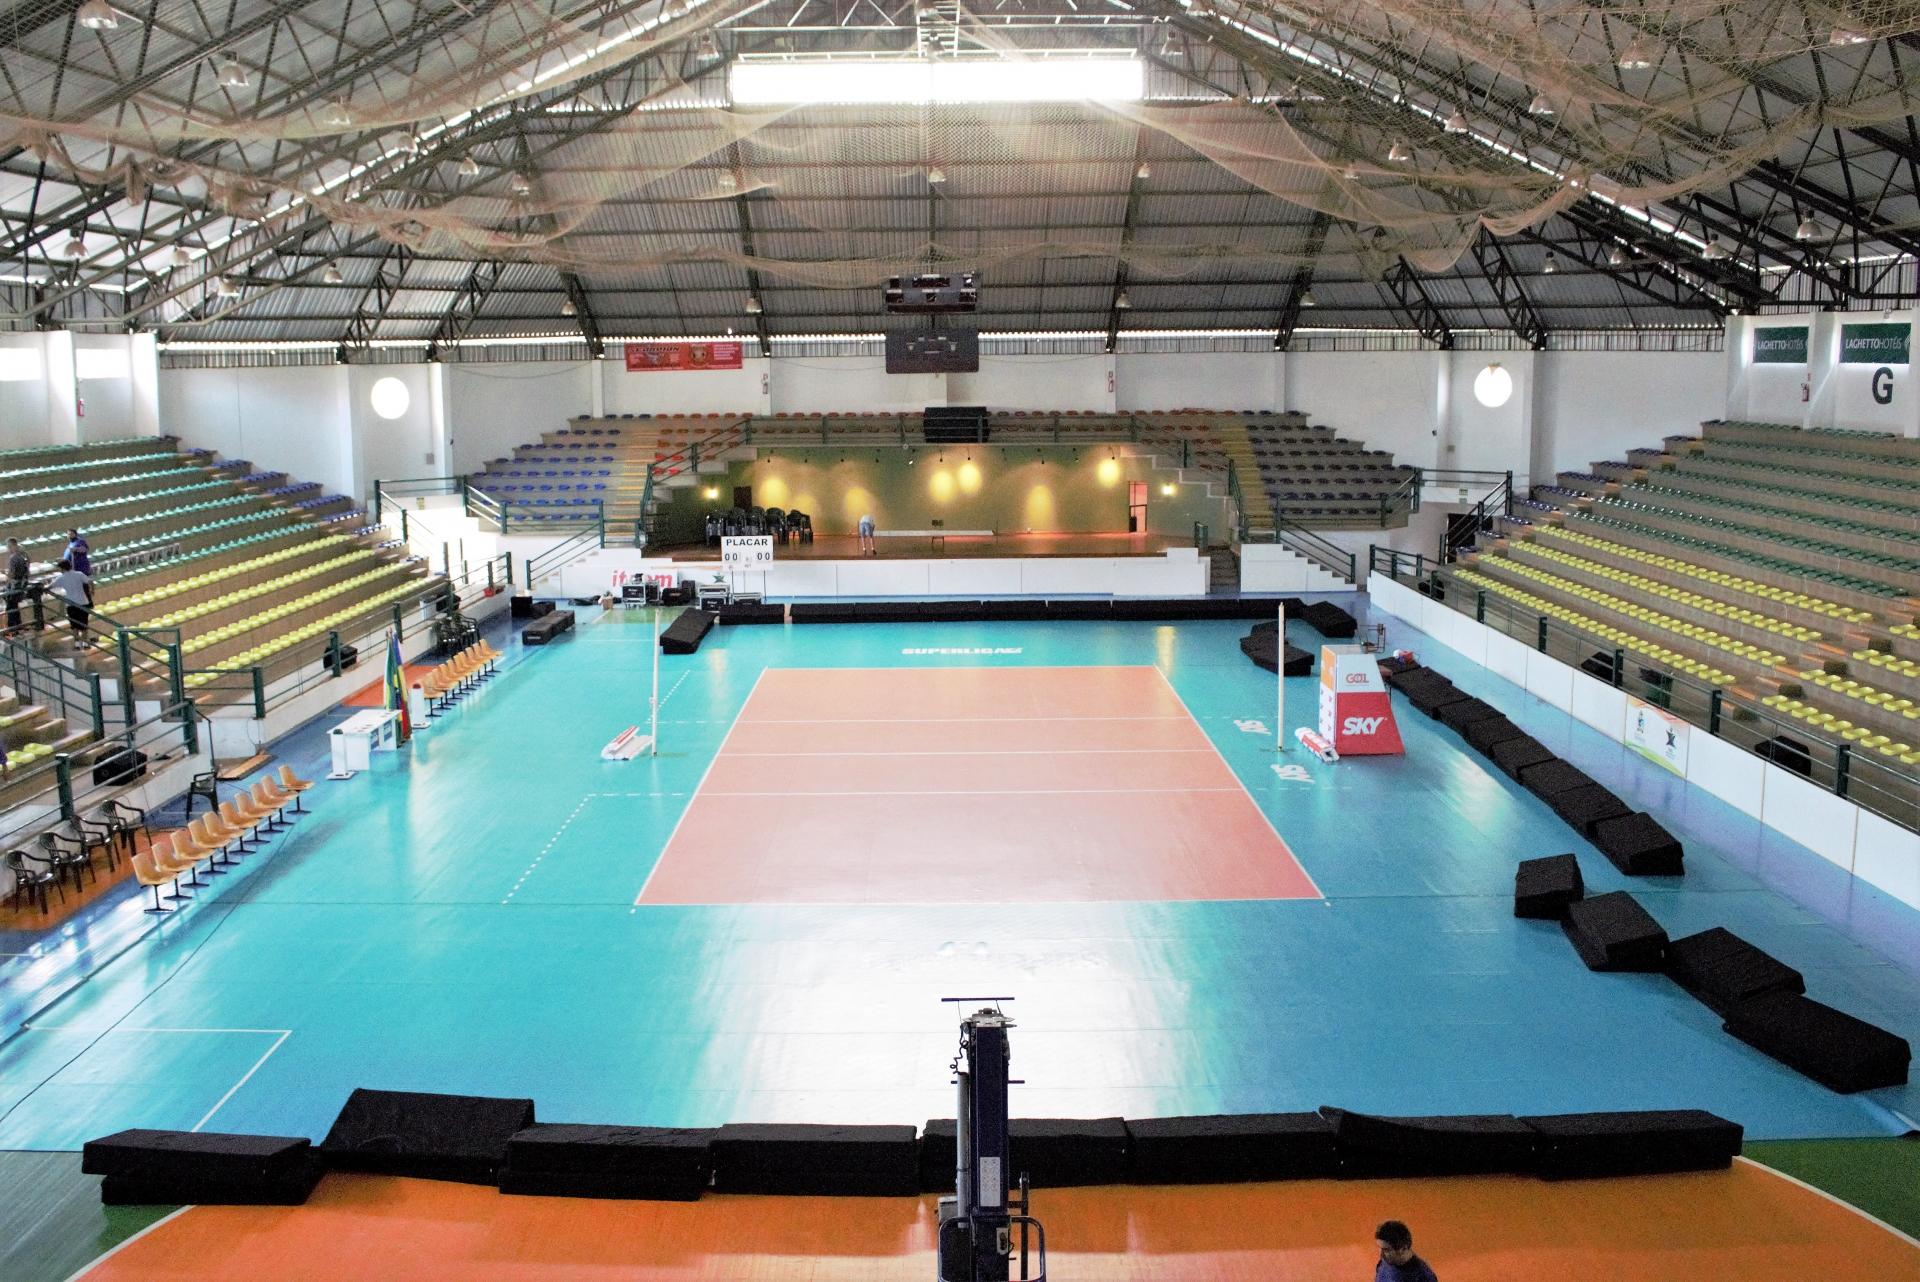 Gramado RS terá 1ª Copa de Futsal LGBTi do Brasil - Jornal O Sul d963136871f87